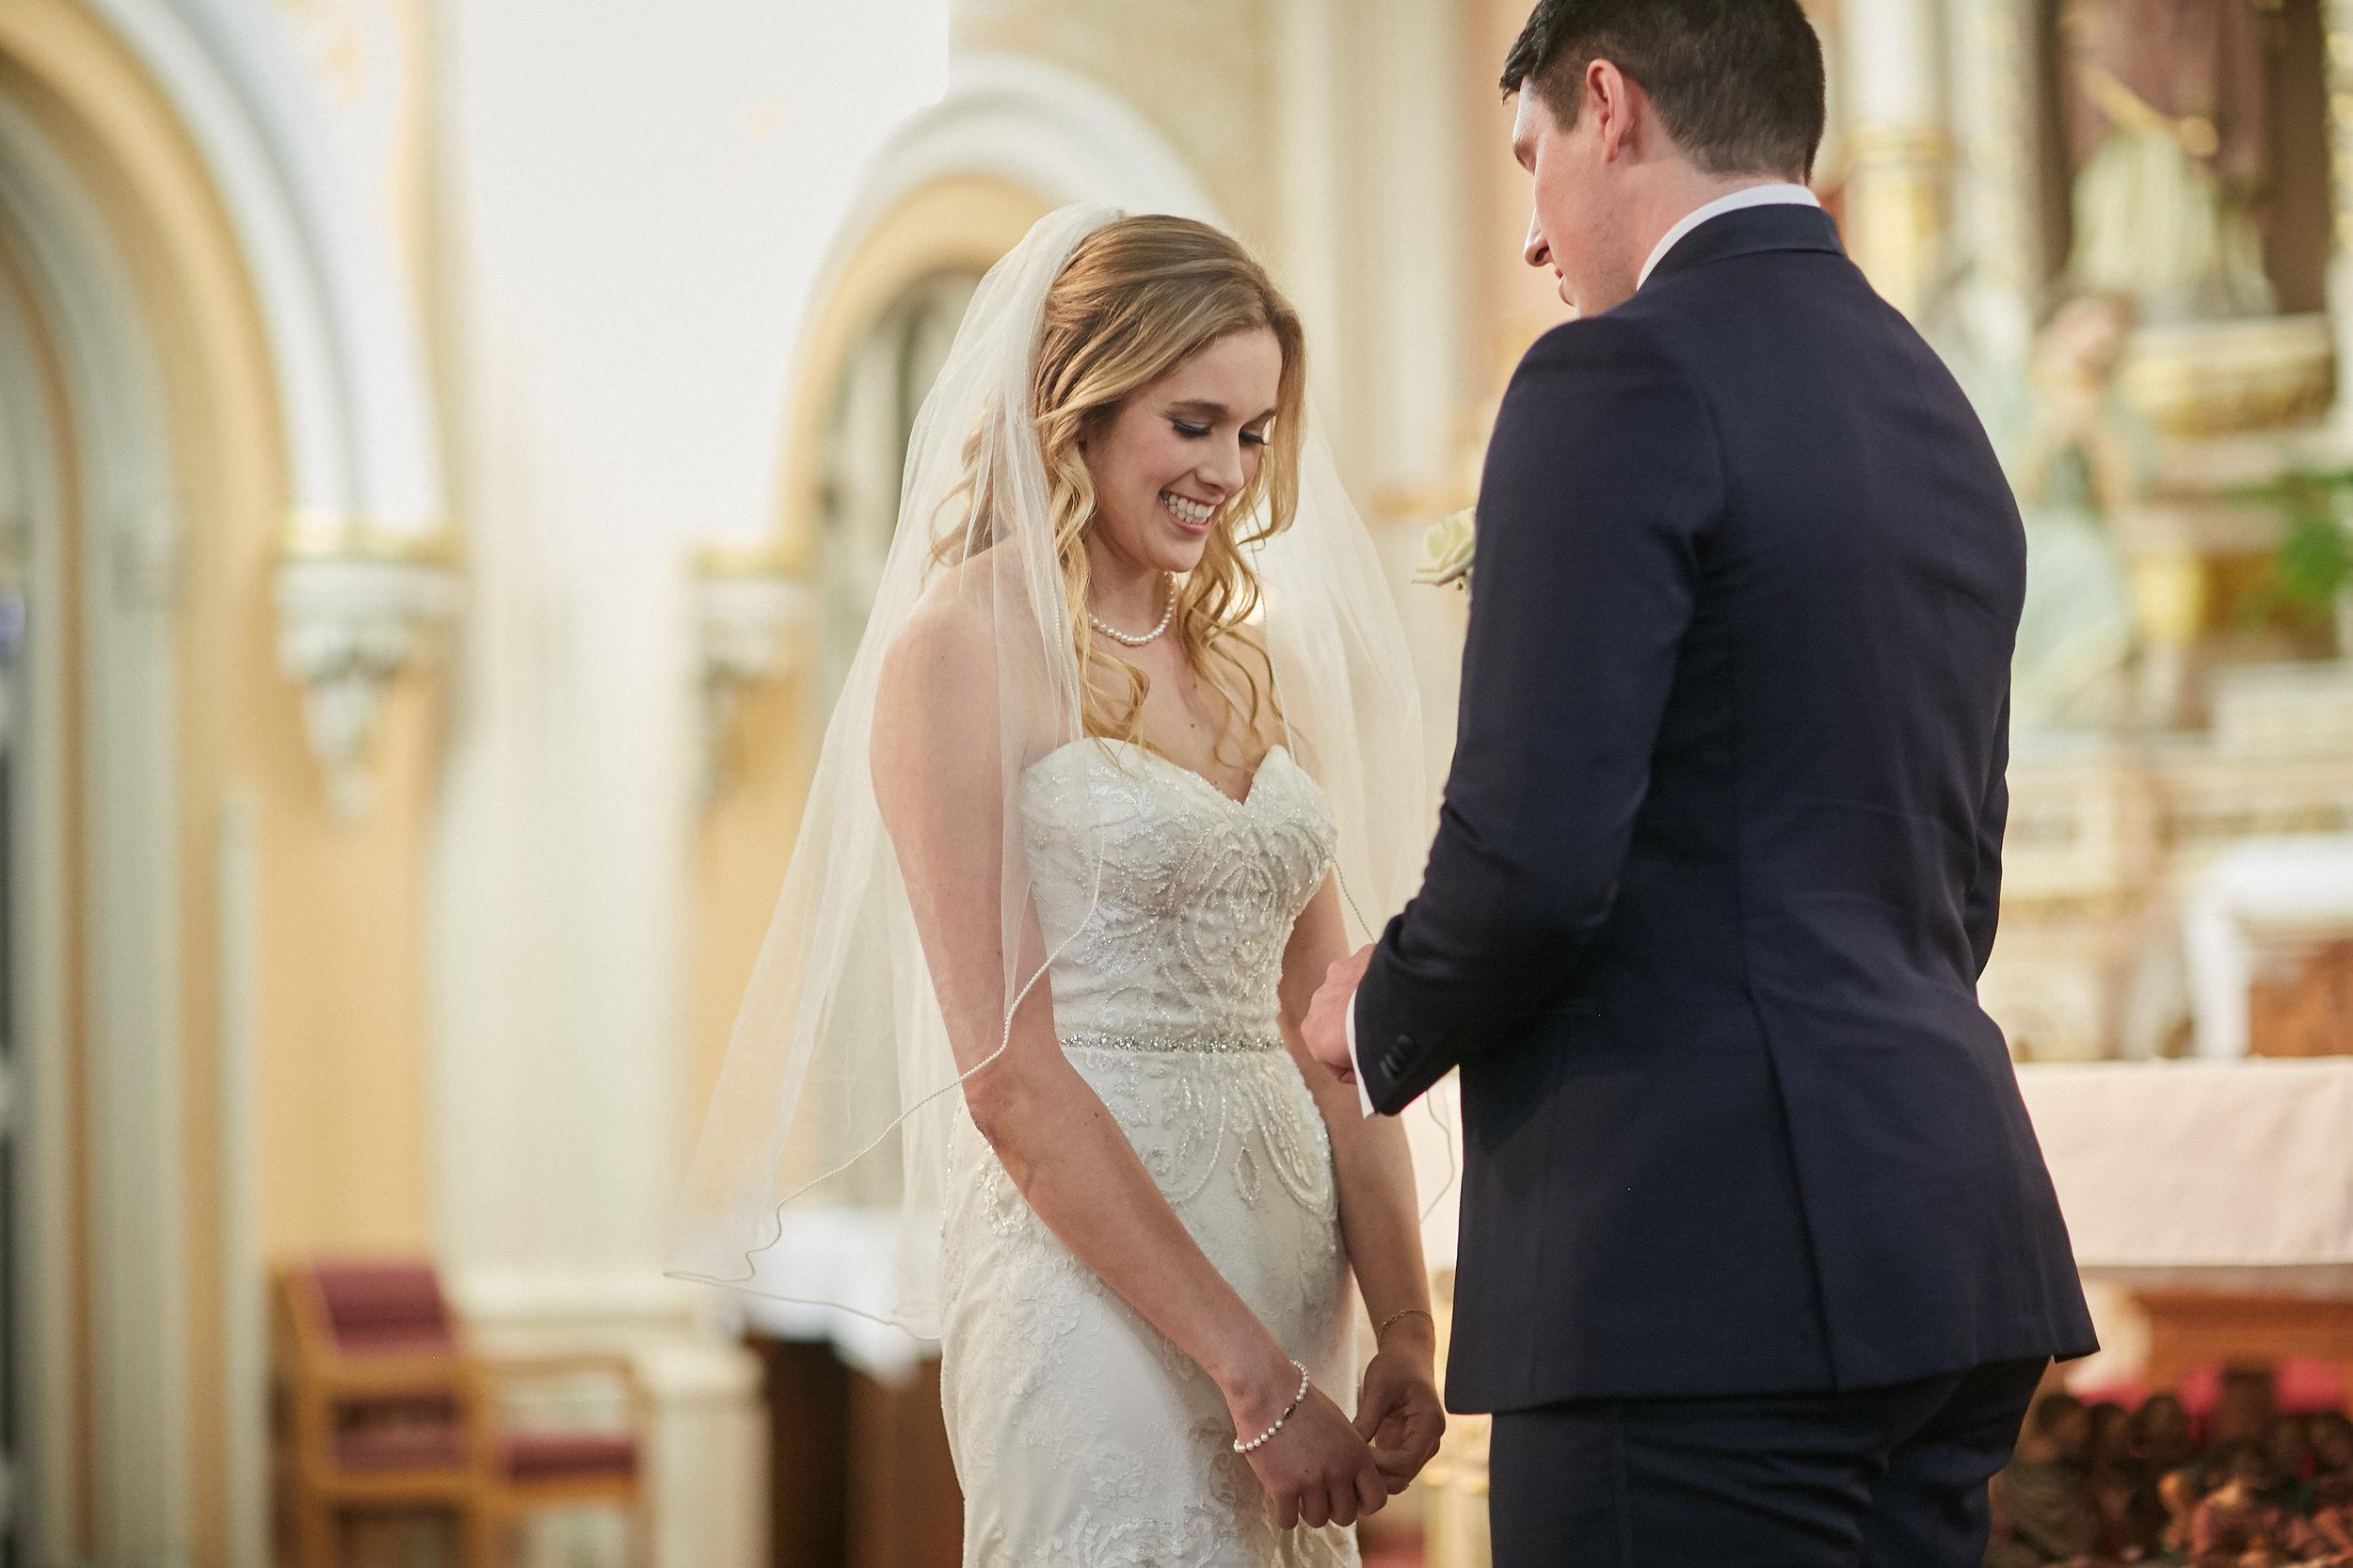 bride groom church wedding ceremony dress pearls veil vows